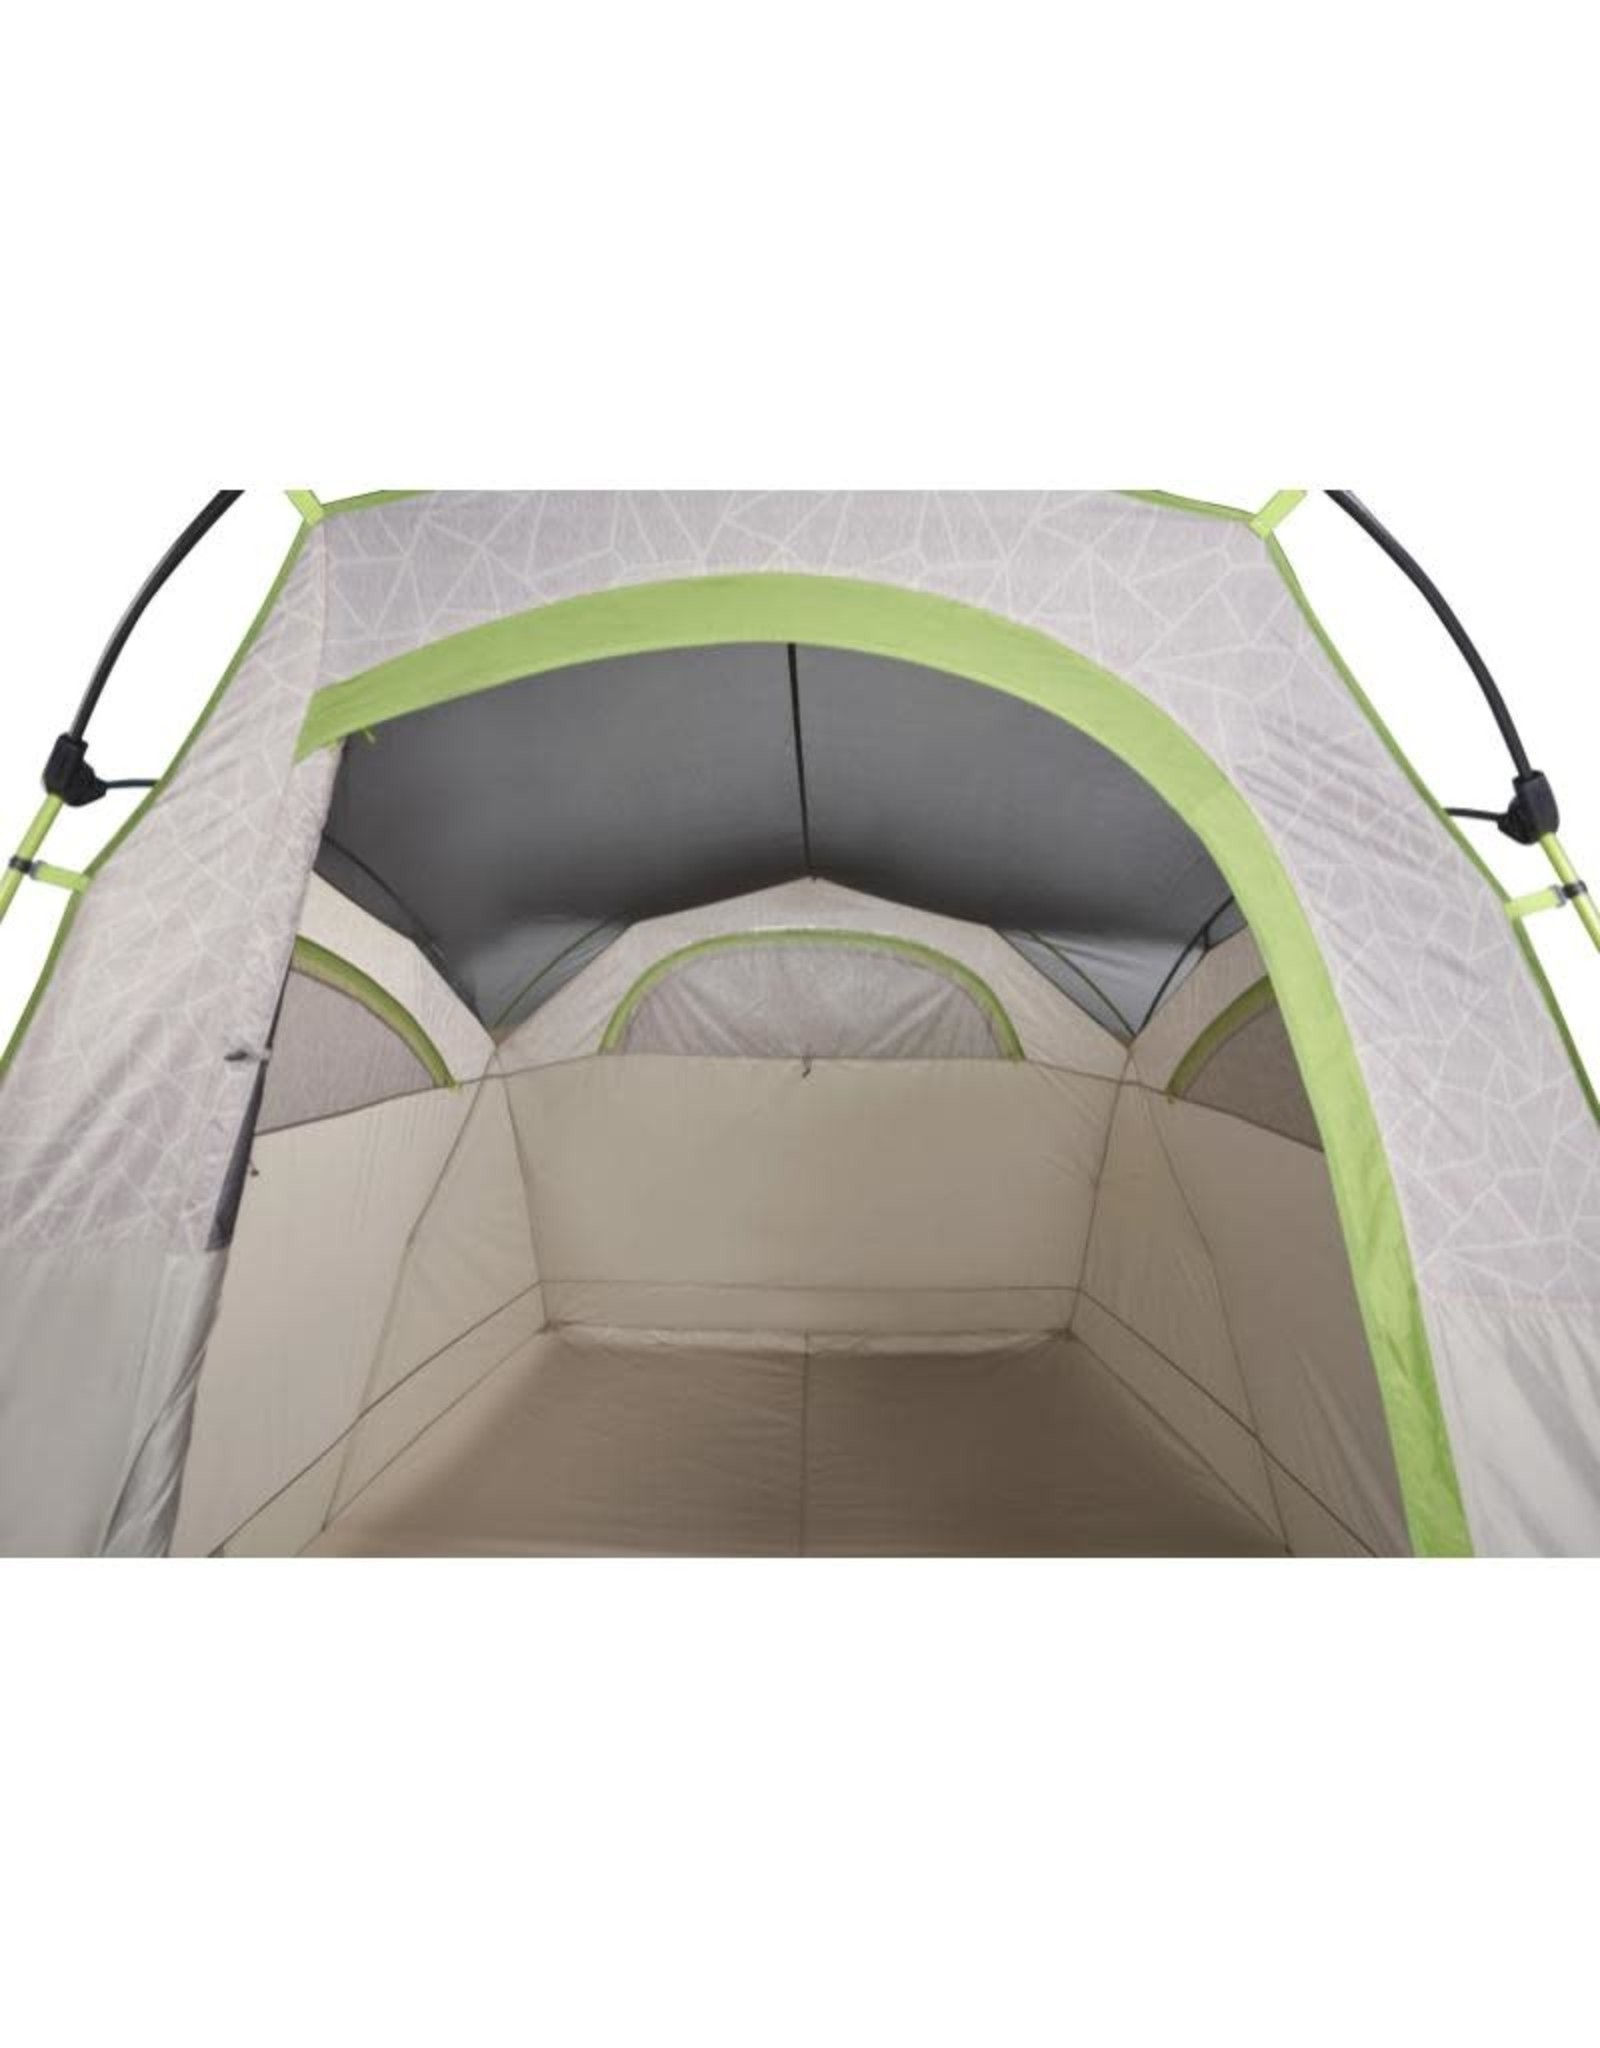 Kelty Camp Cabin 4